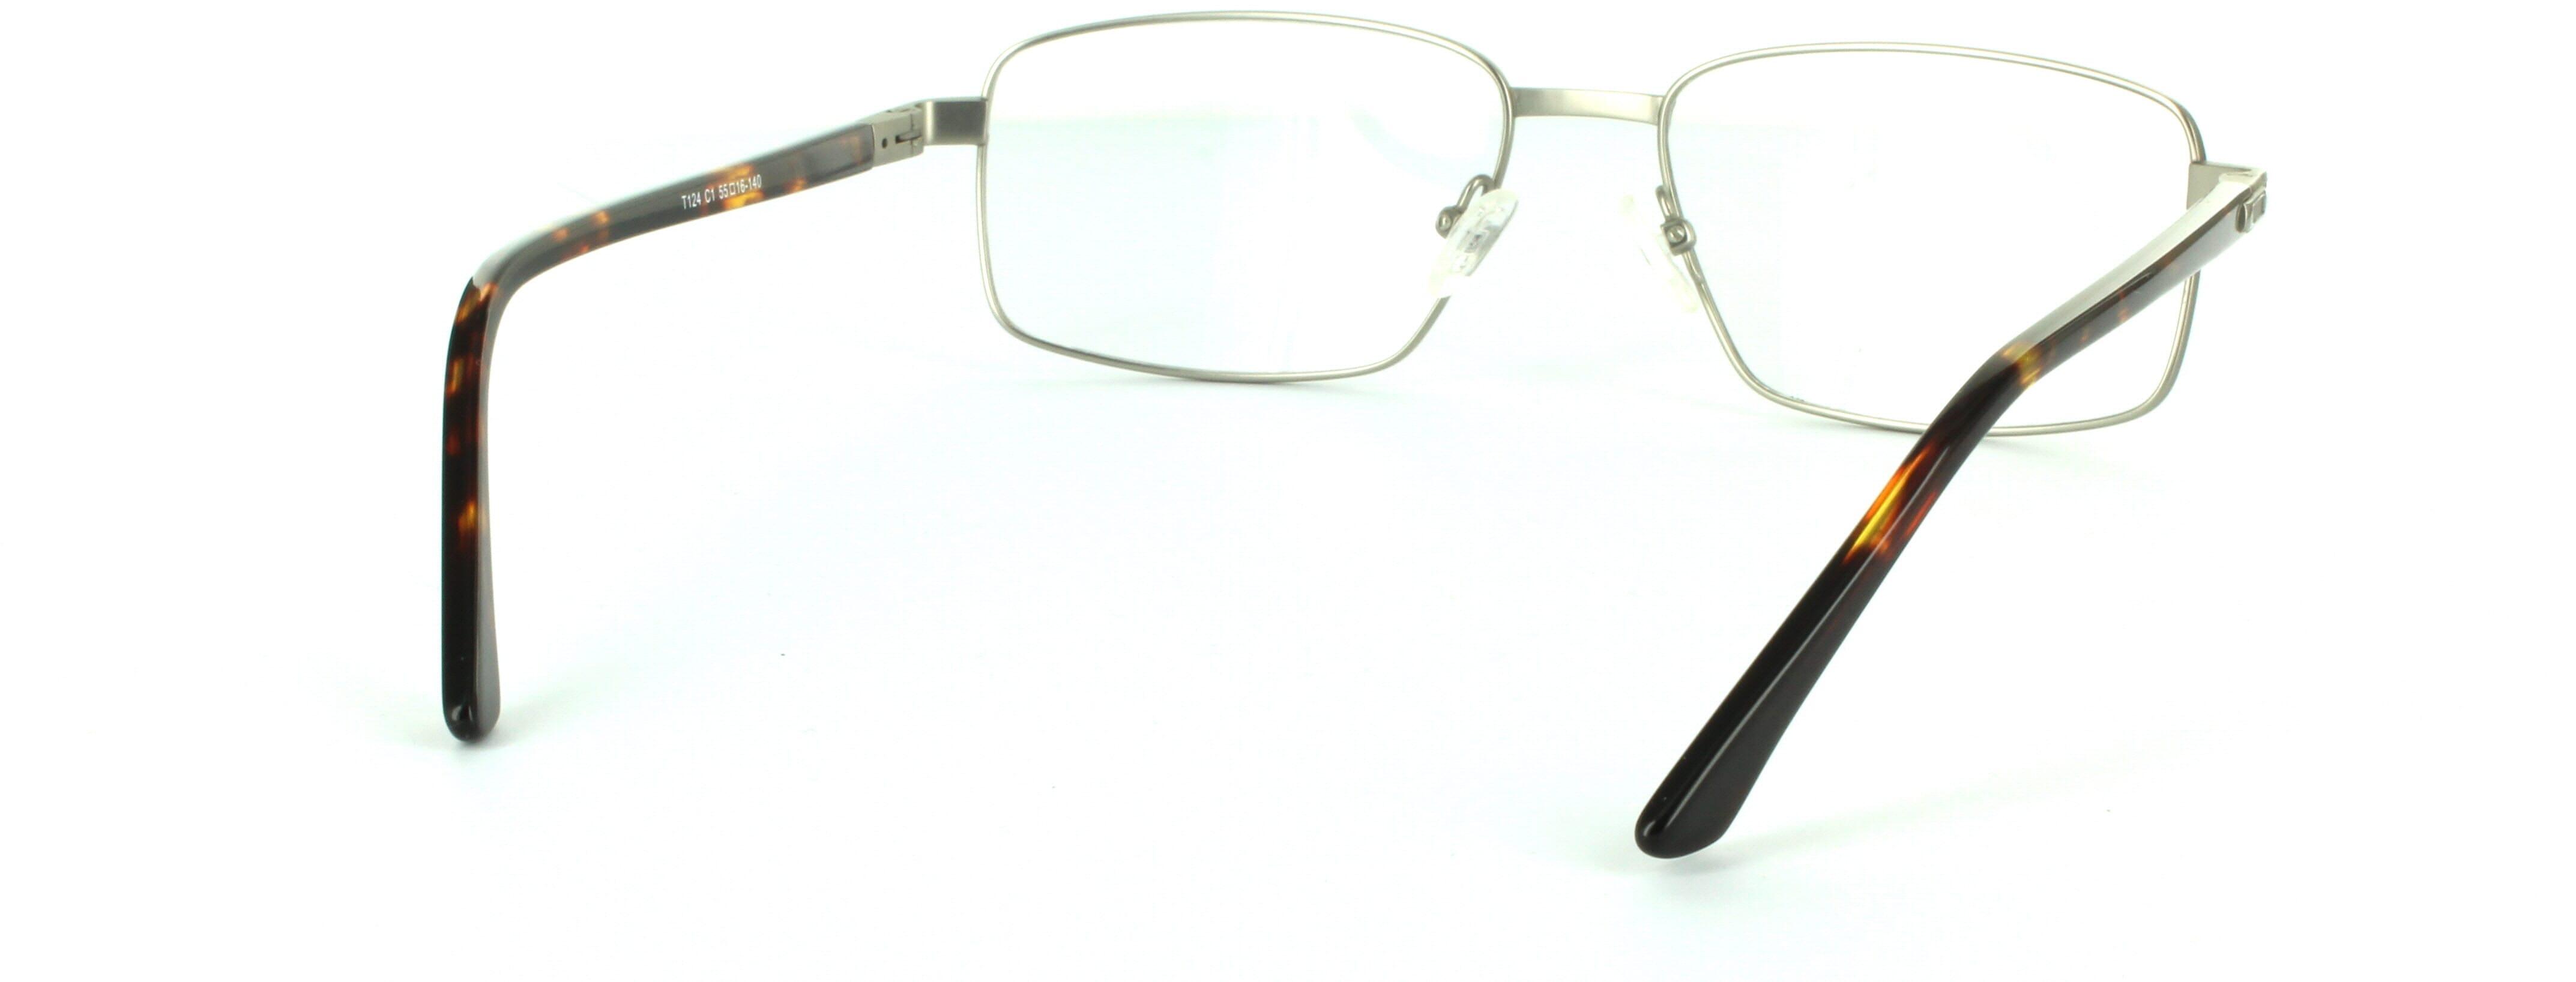 f5de800517 Titanium Spectacles   Eyewear Glasses